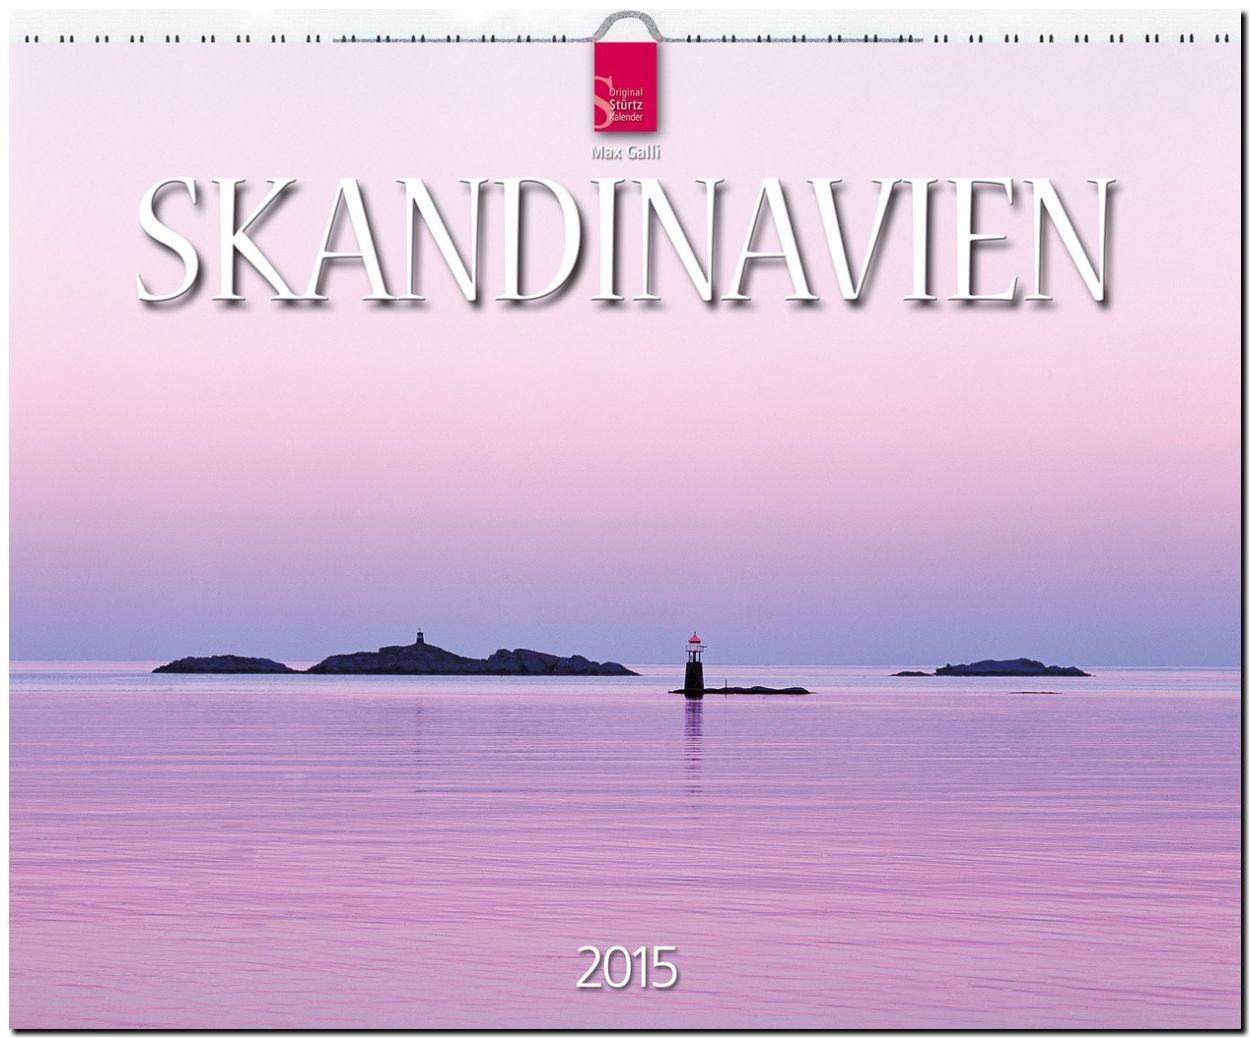 SKANDINAVIEN 2015 - Norwegen - Schweden - Finnland - Original Stürtz-Kalender - Großformat-Kalender 60 x 48 cm